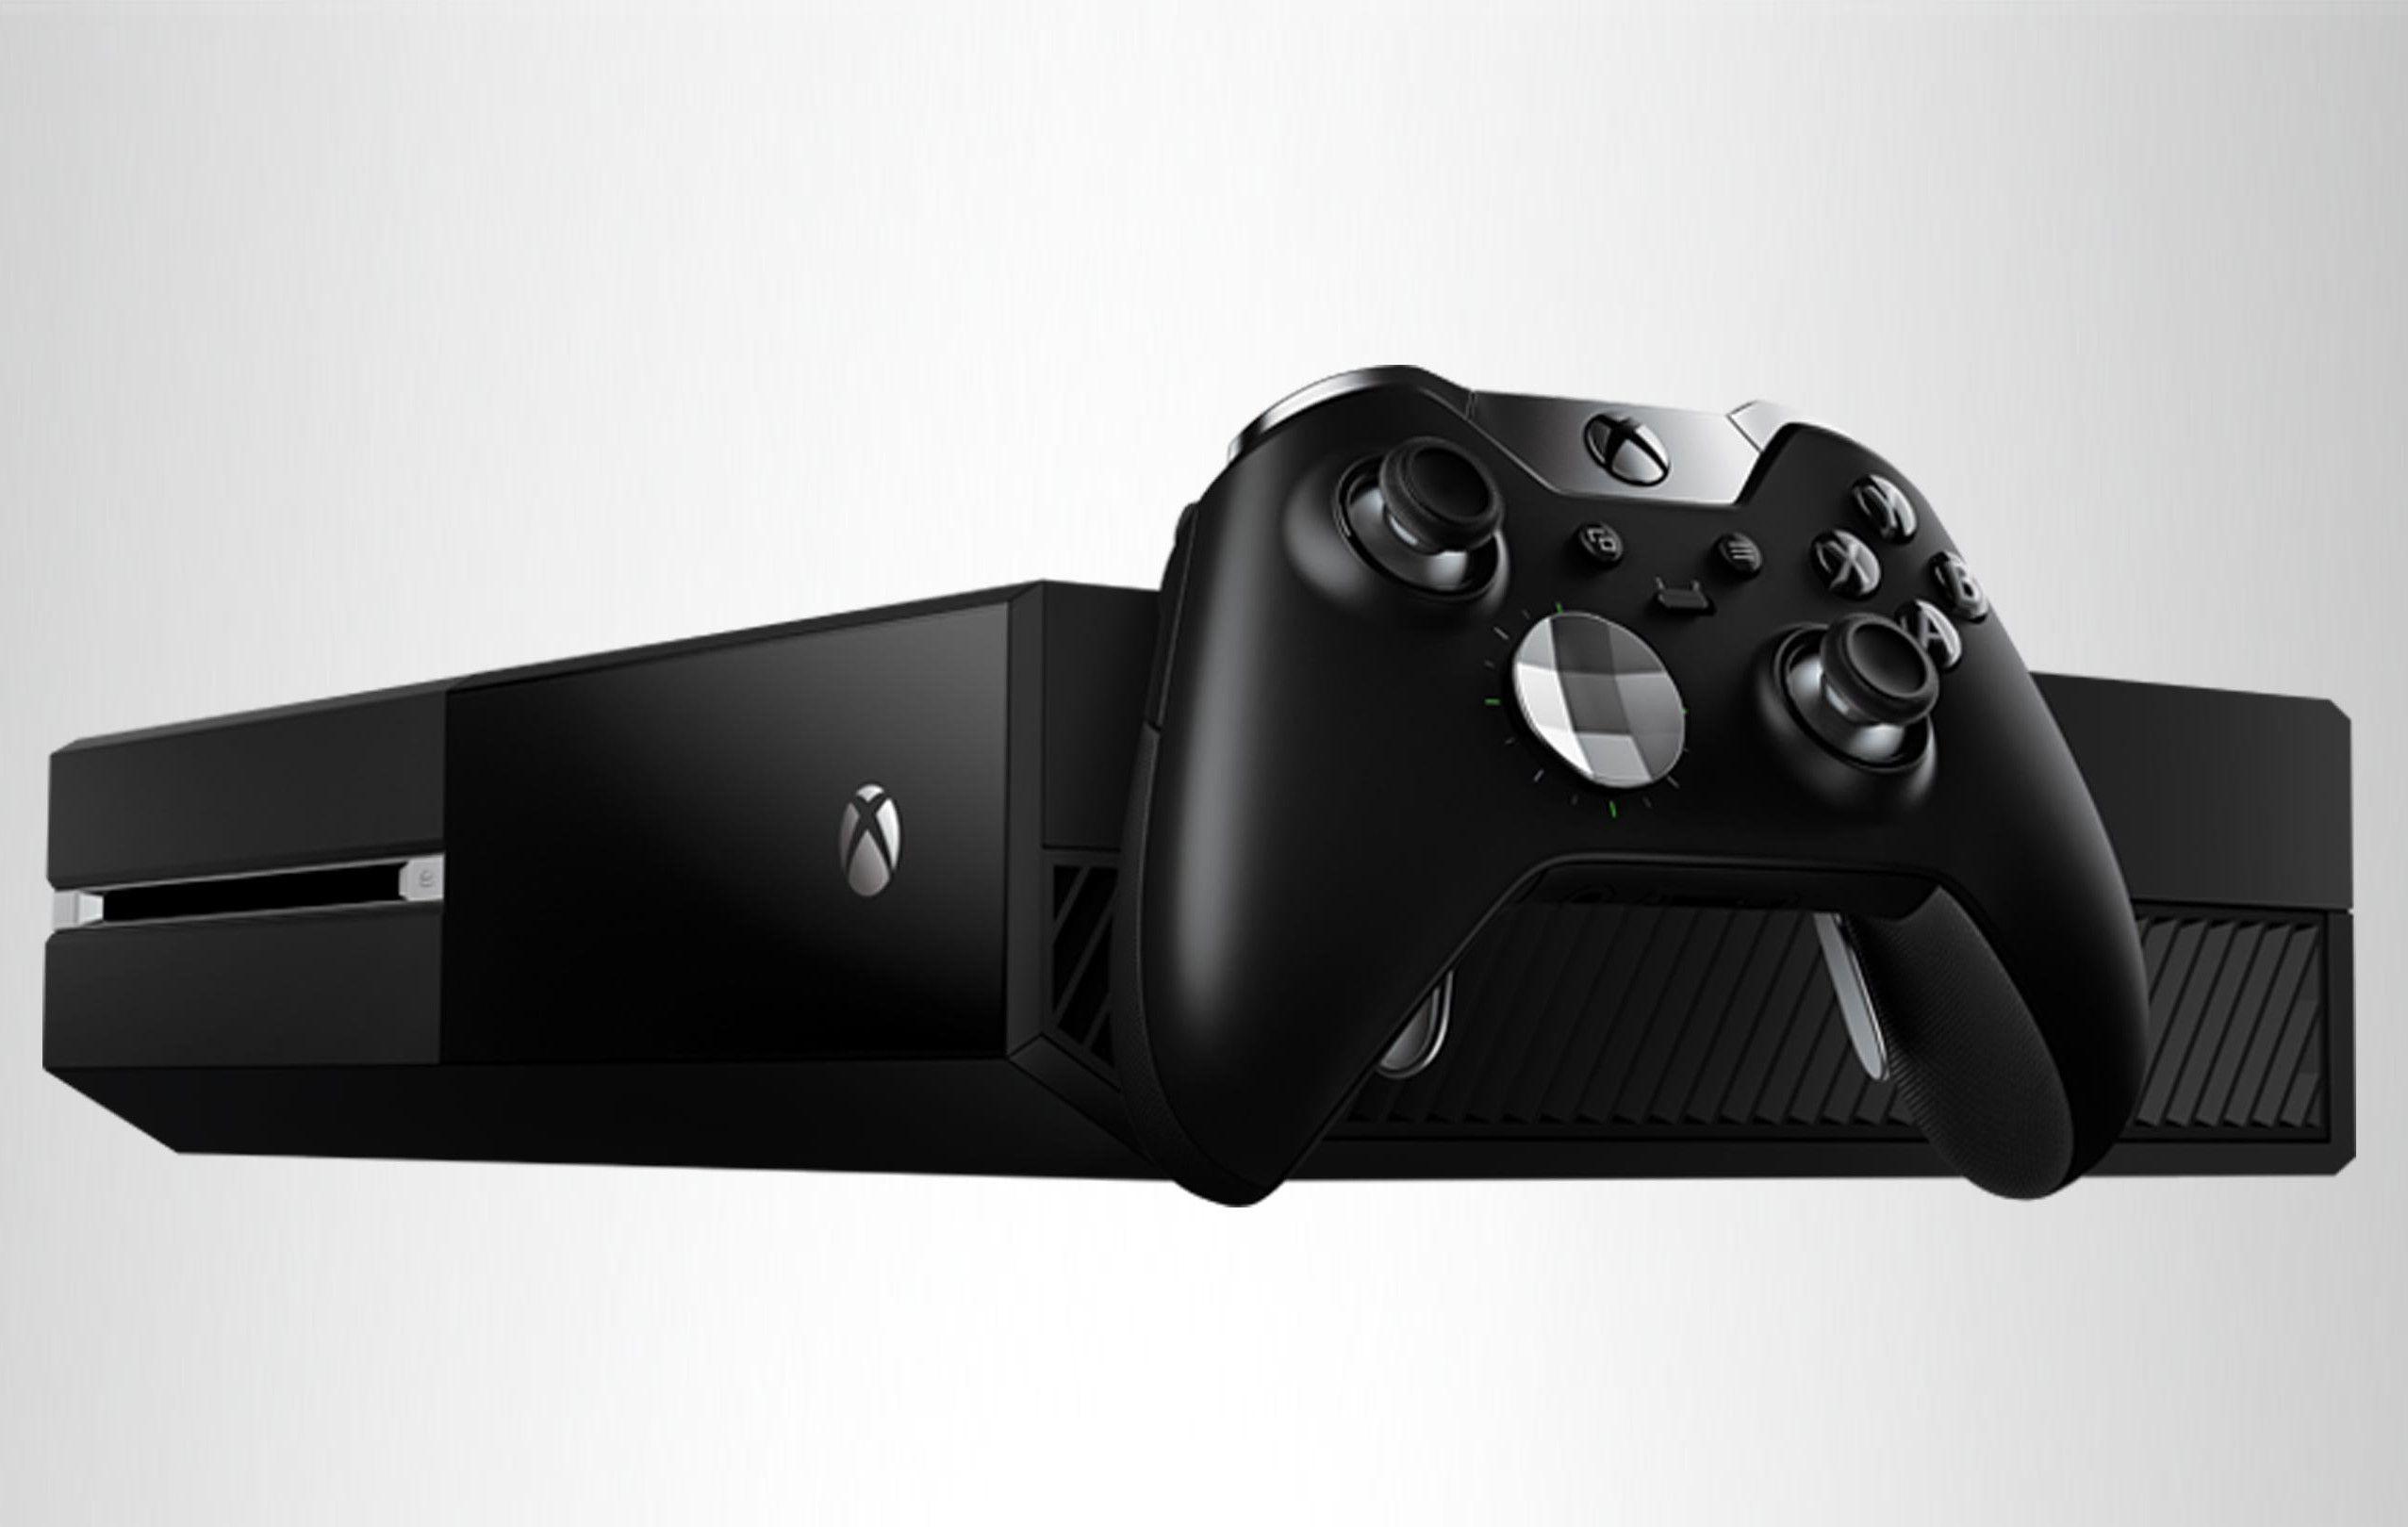 Xbox One Elite console